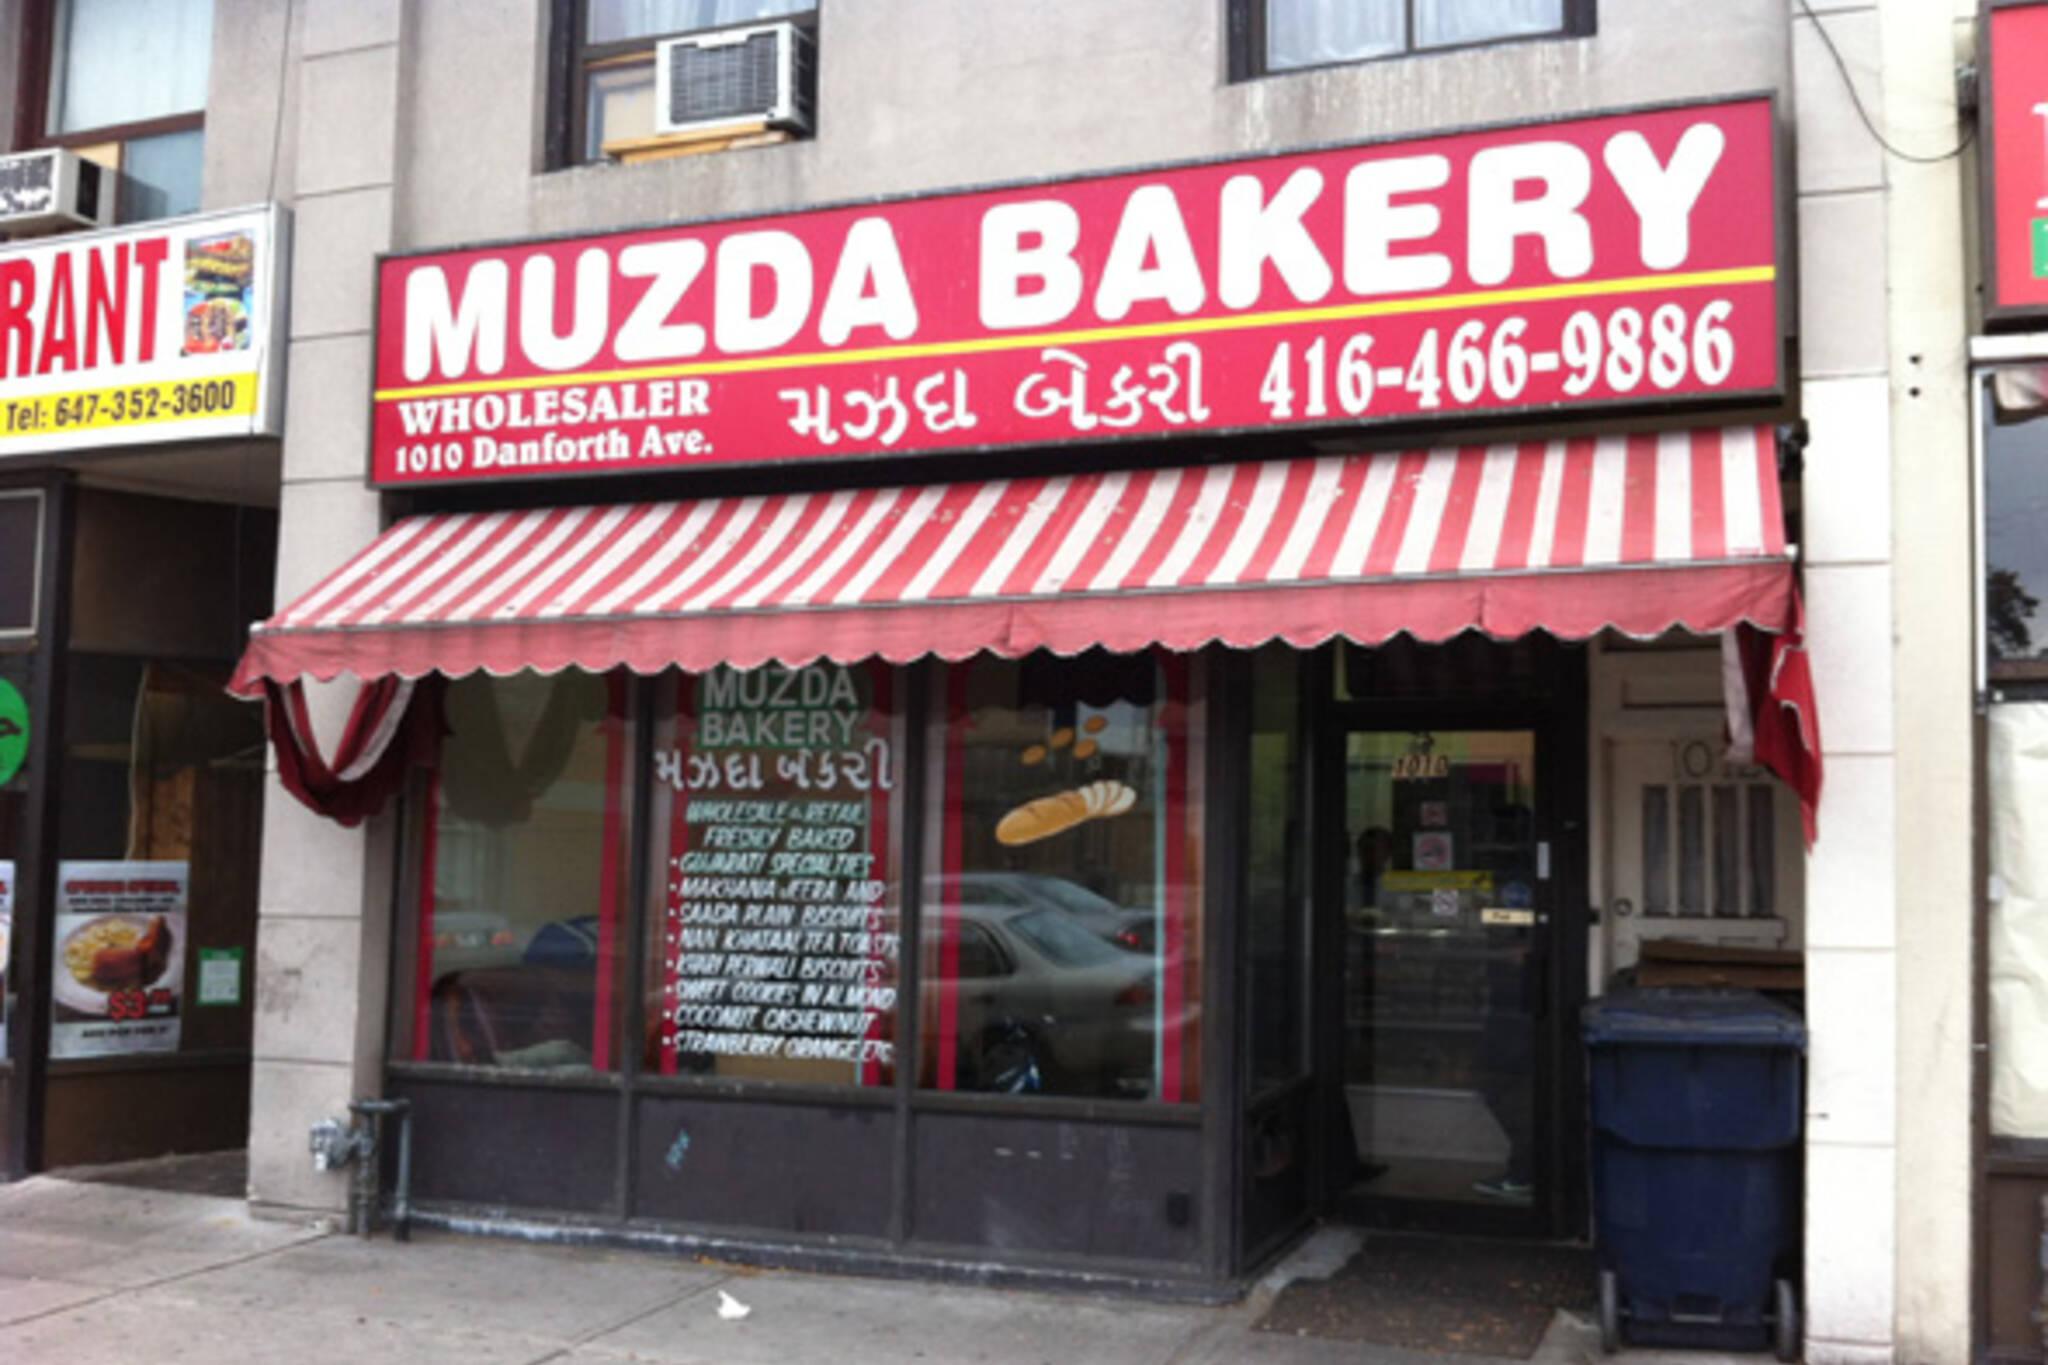 Muzda Bakery